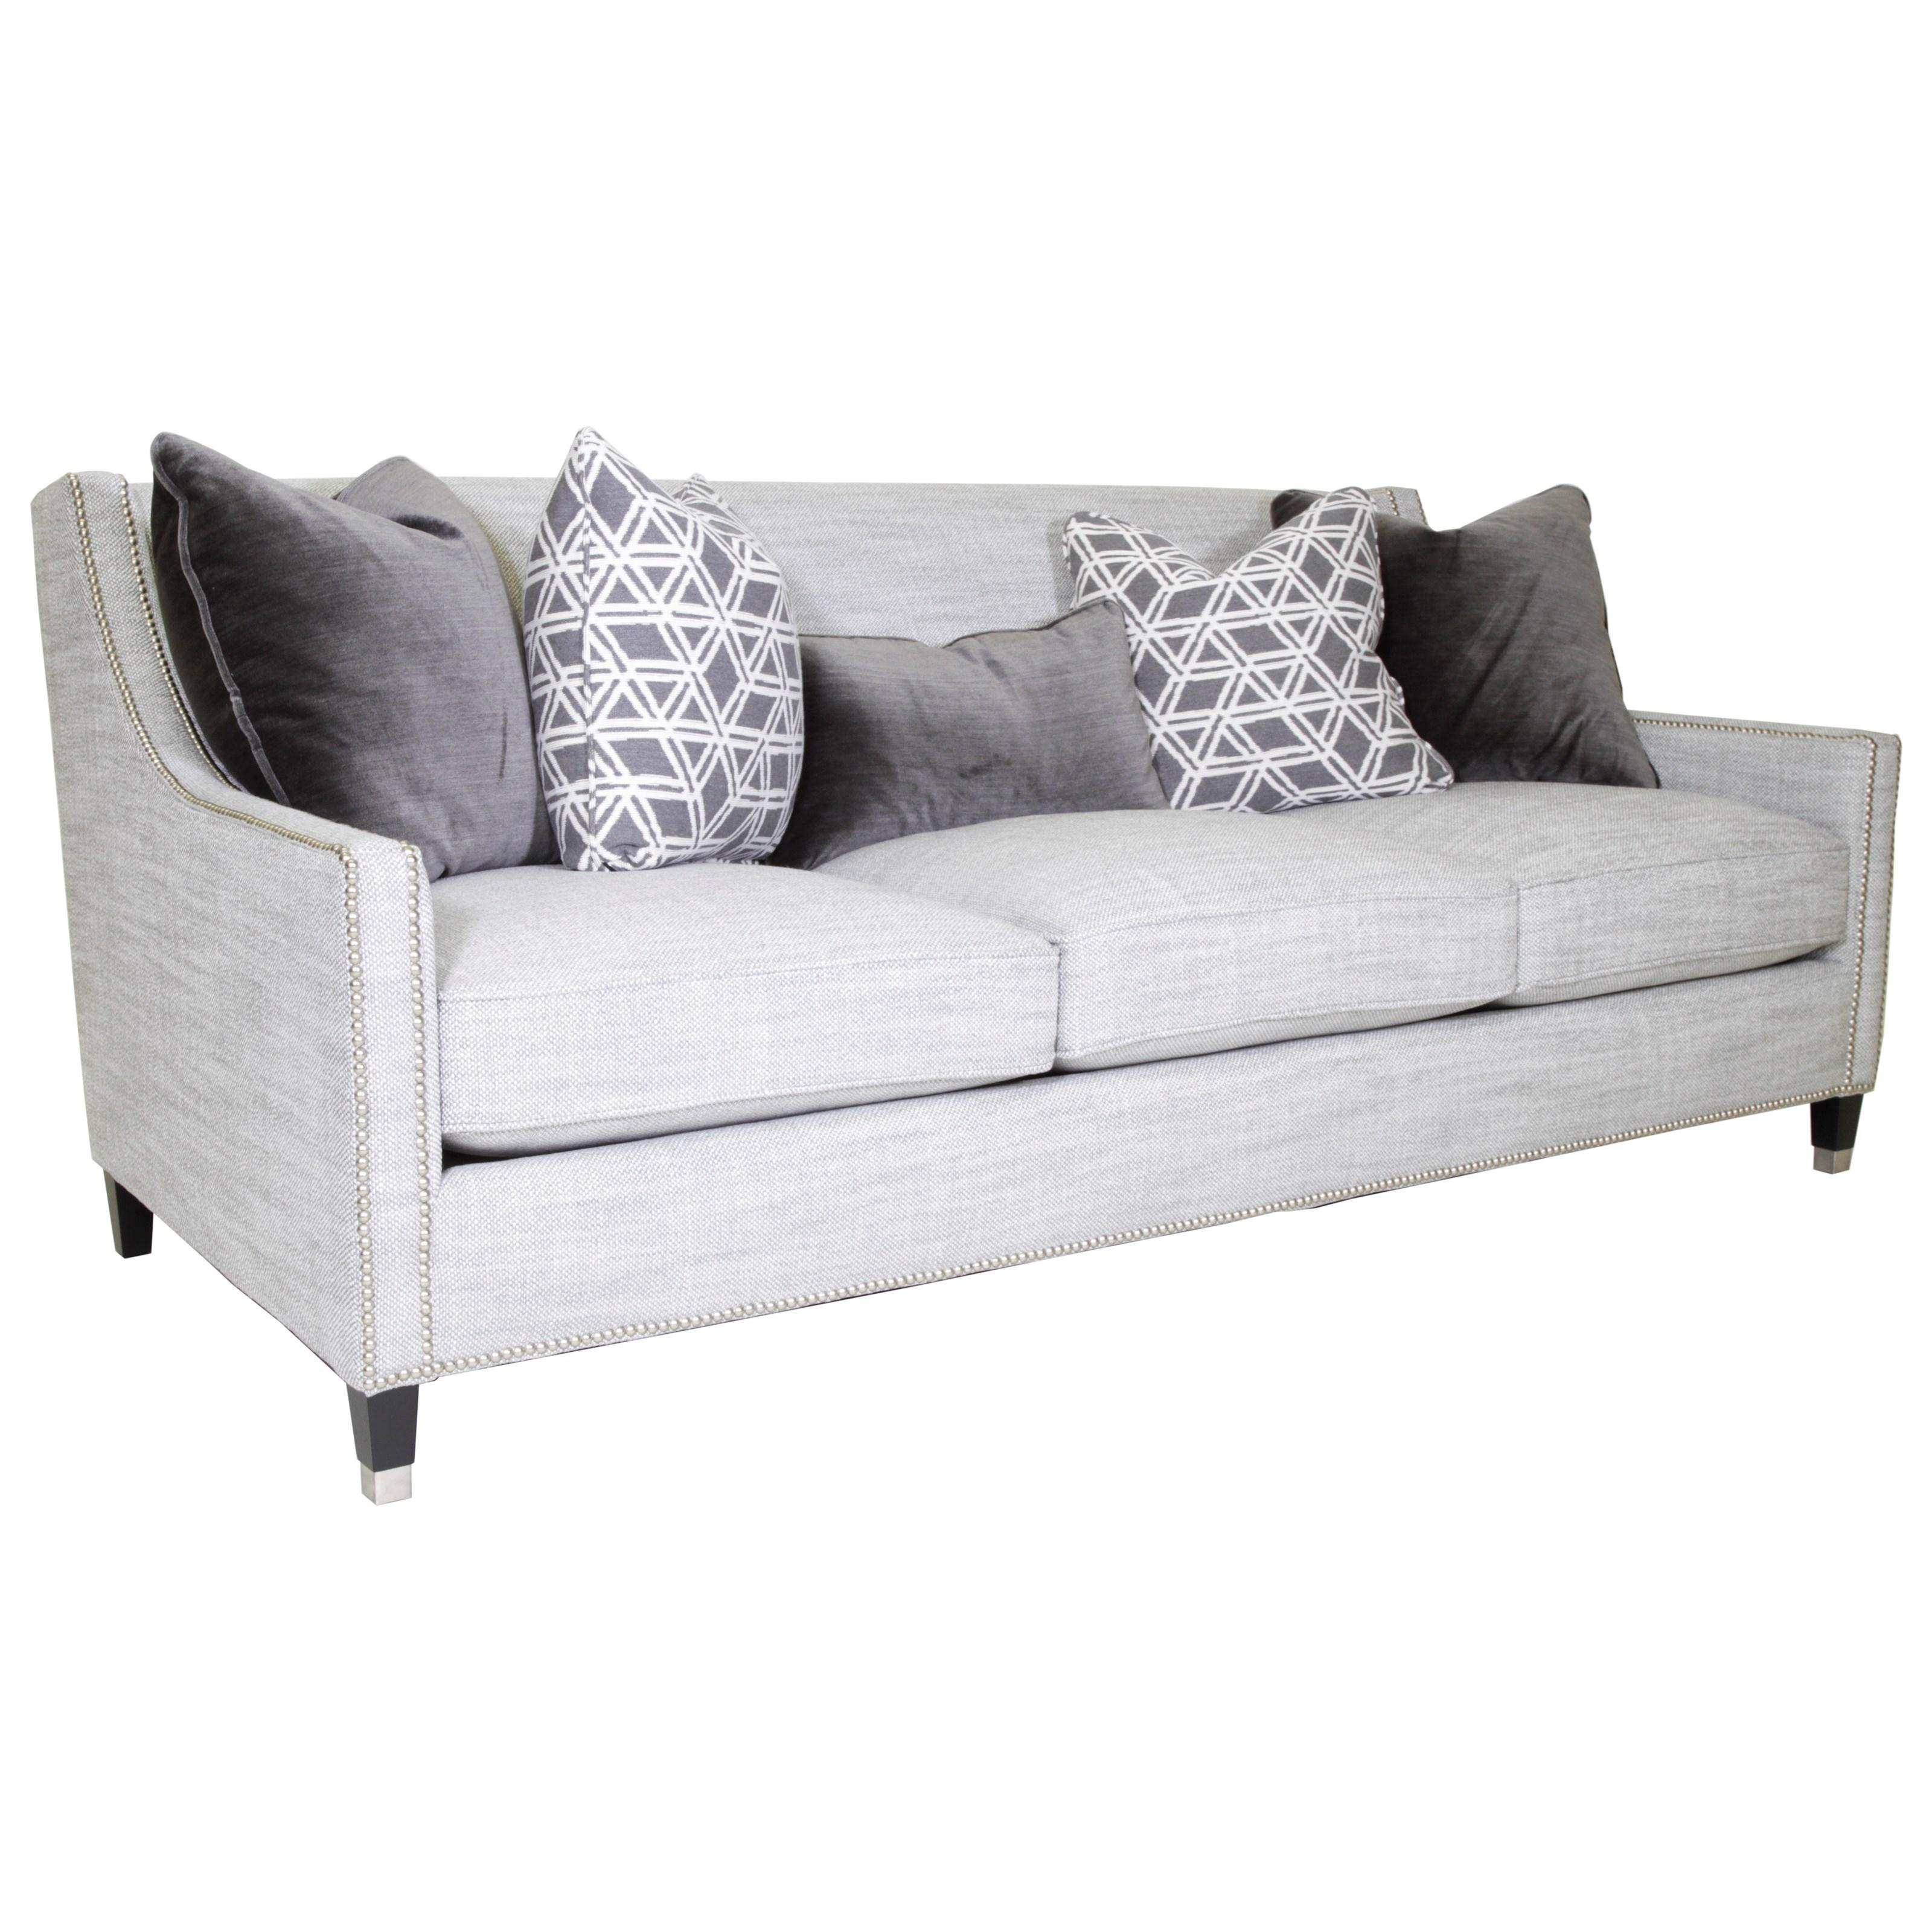 bernhardt sofas non flame ant sofa palisades c s wo sons california palisadessofa